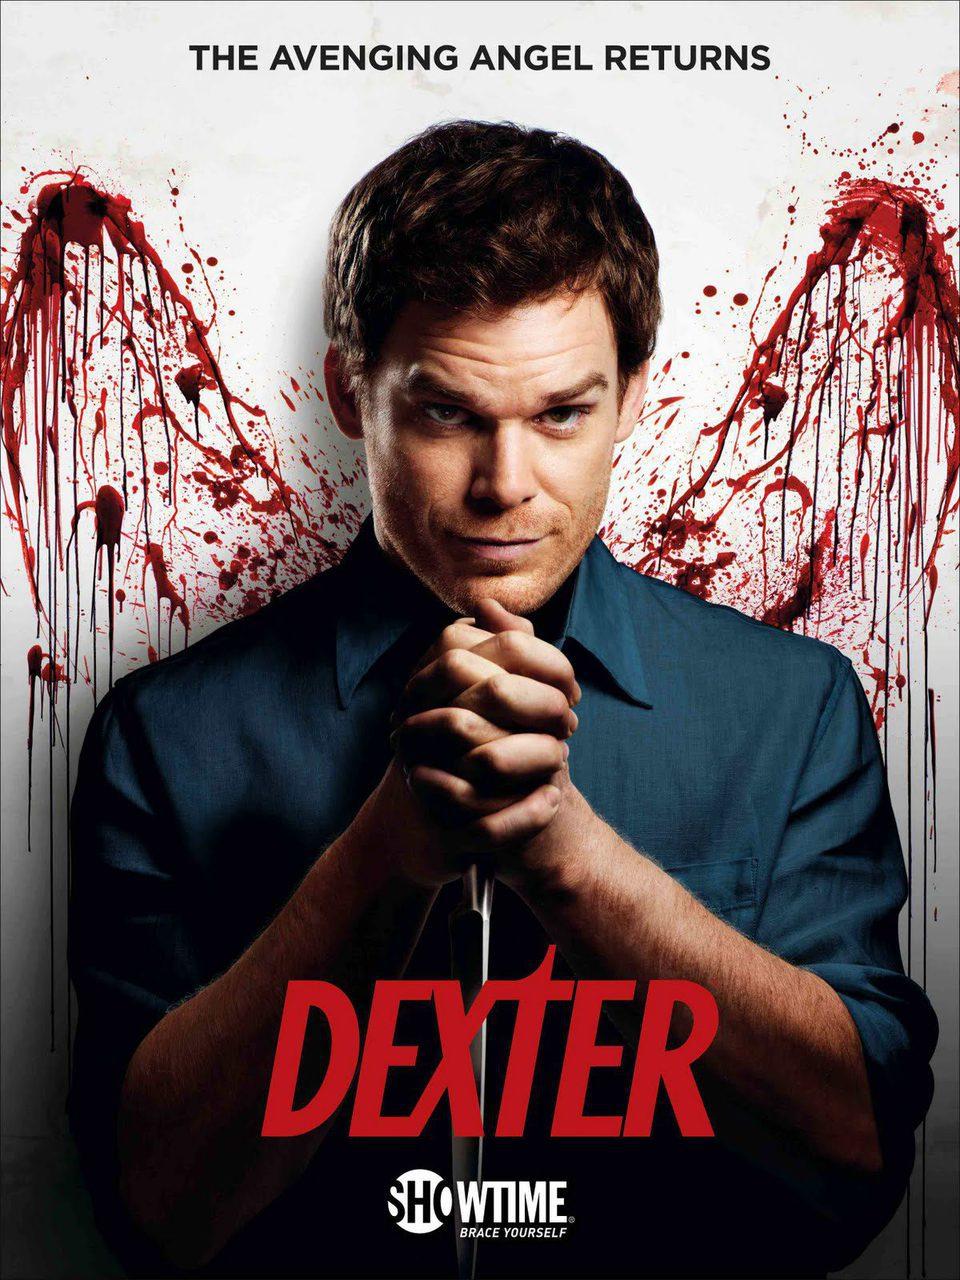 Cartel Temporada 6 de 'Dexter'